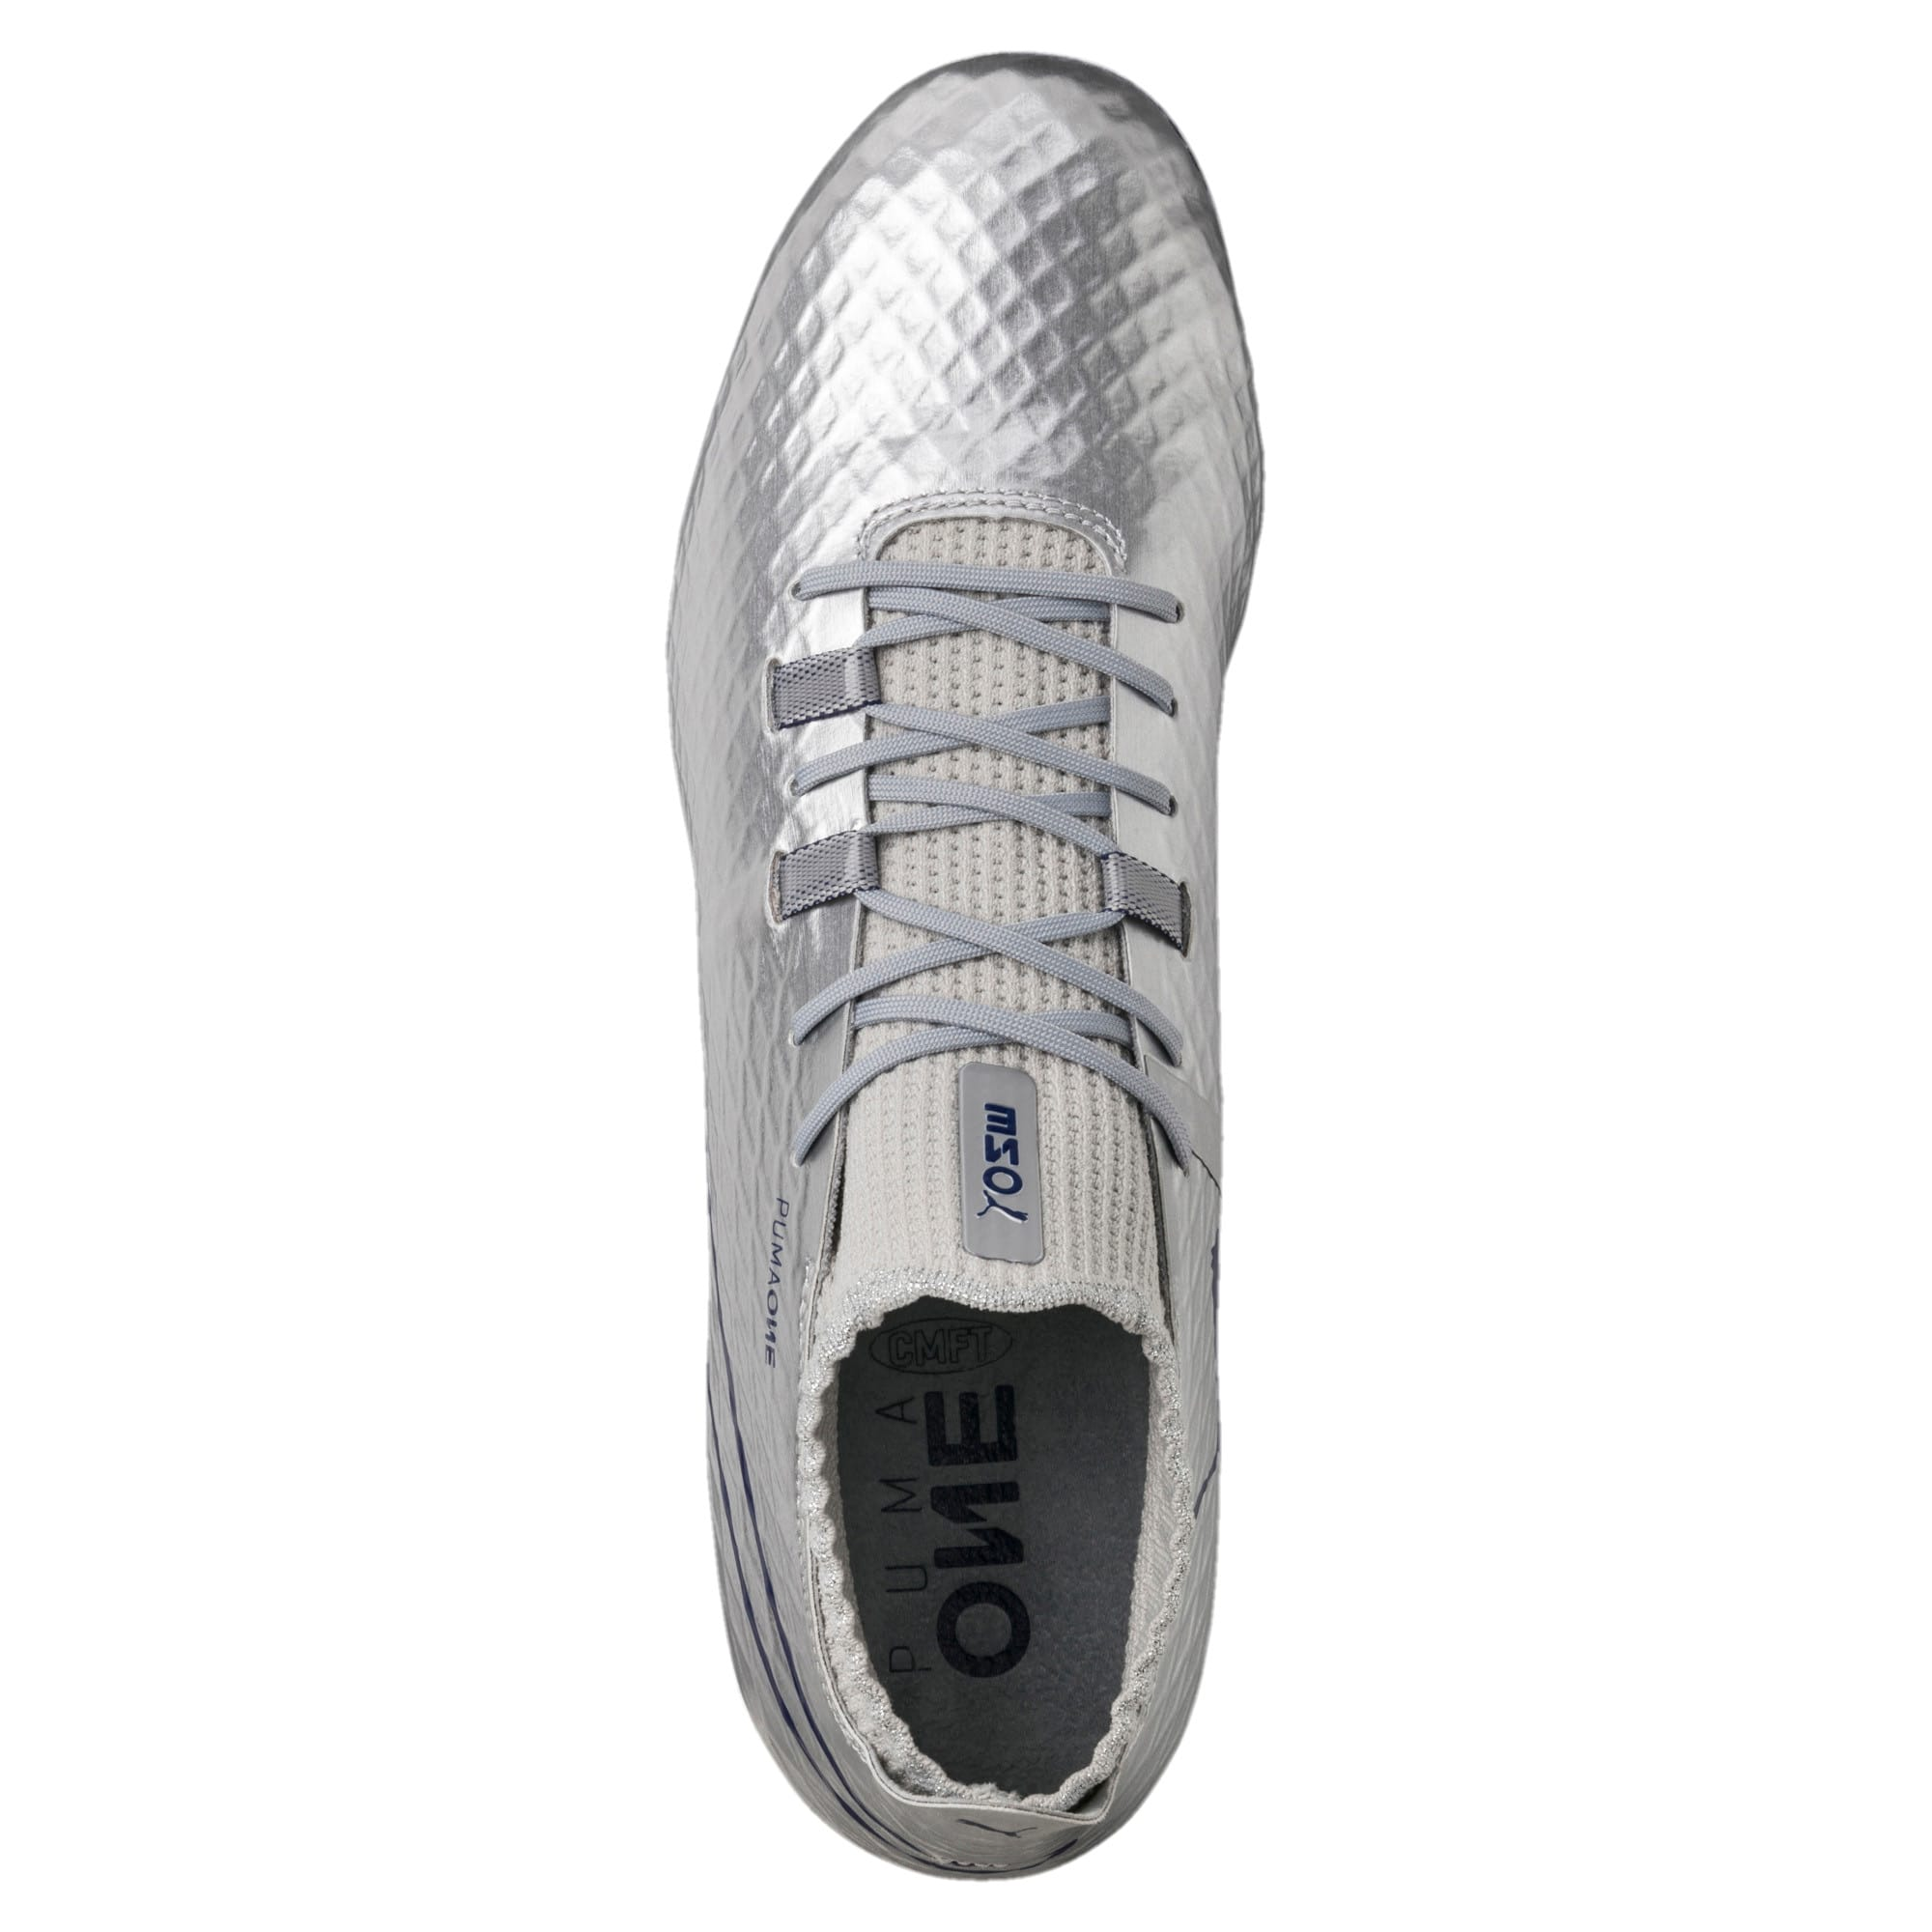 Thumbnail 5 of PUMA ONE Chrome FG Men's Soccer Cleats, Silver-Blue Depths, medium